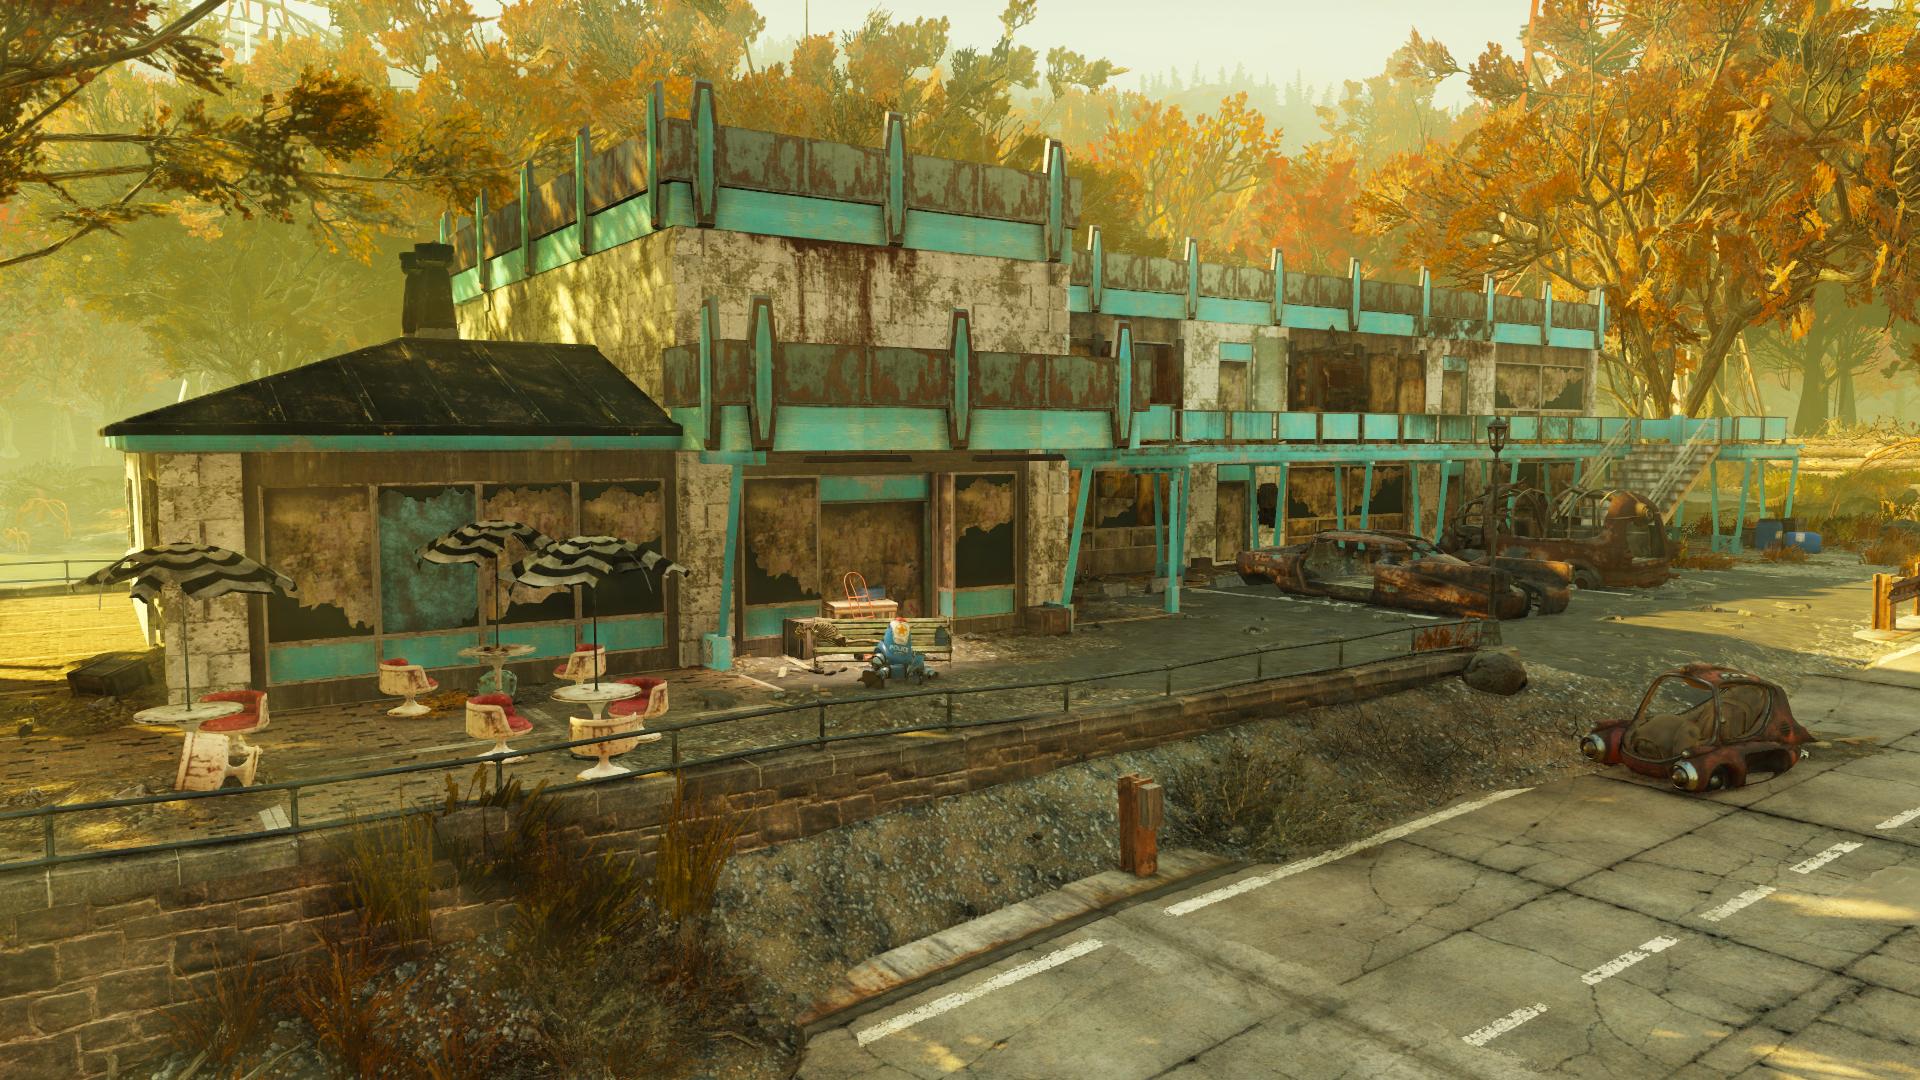 Southern Belle Motel